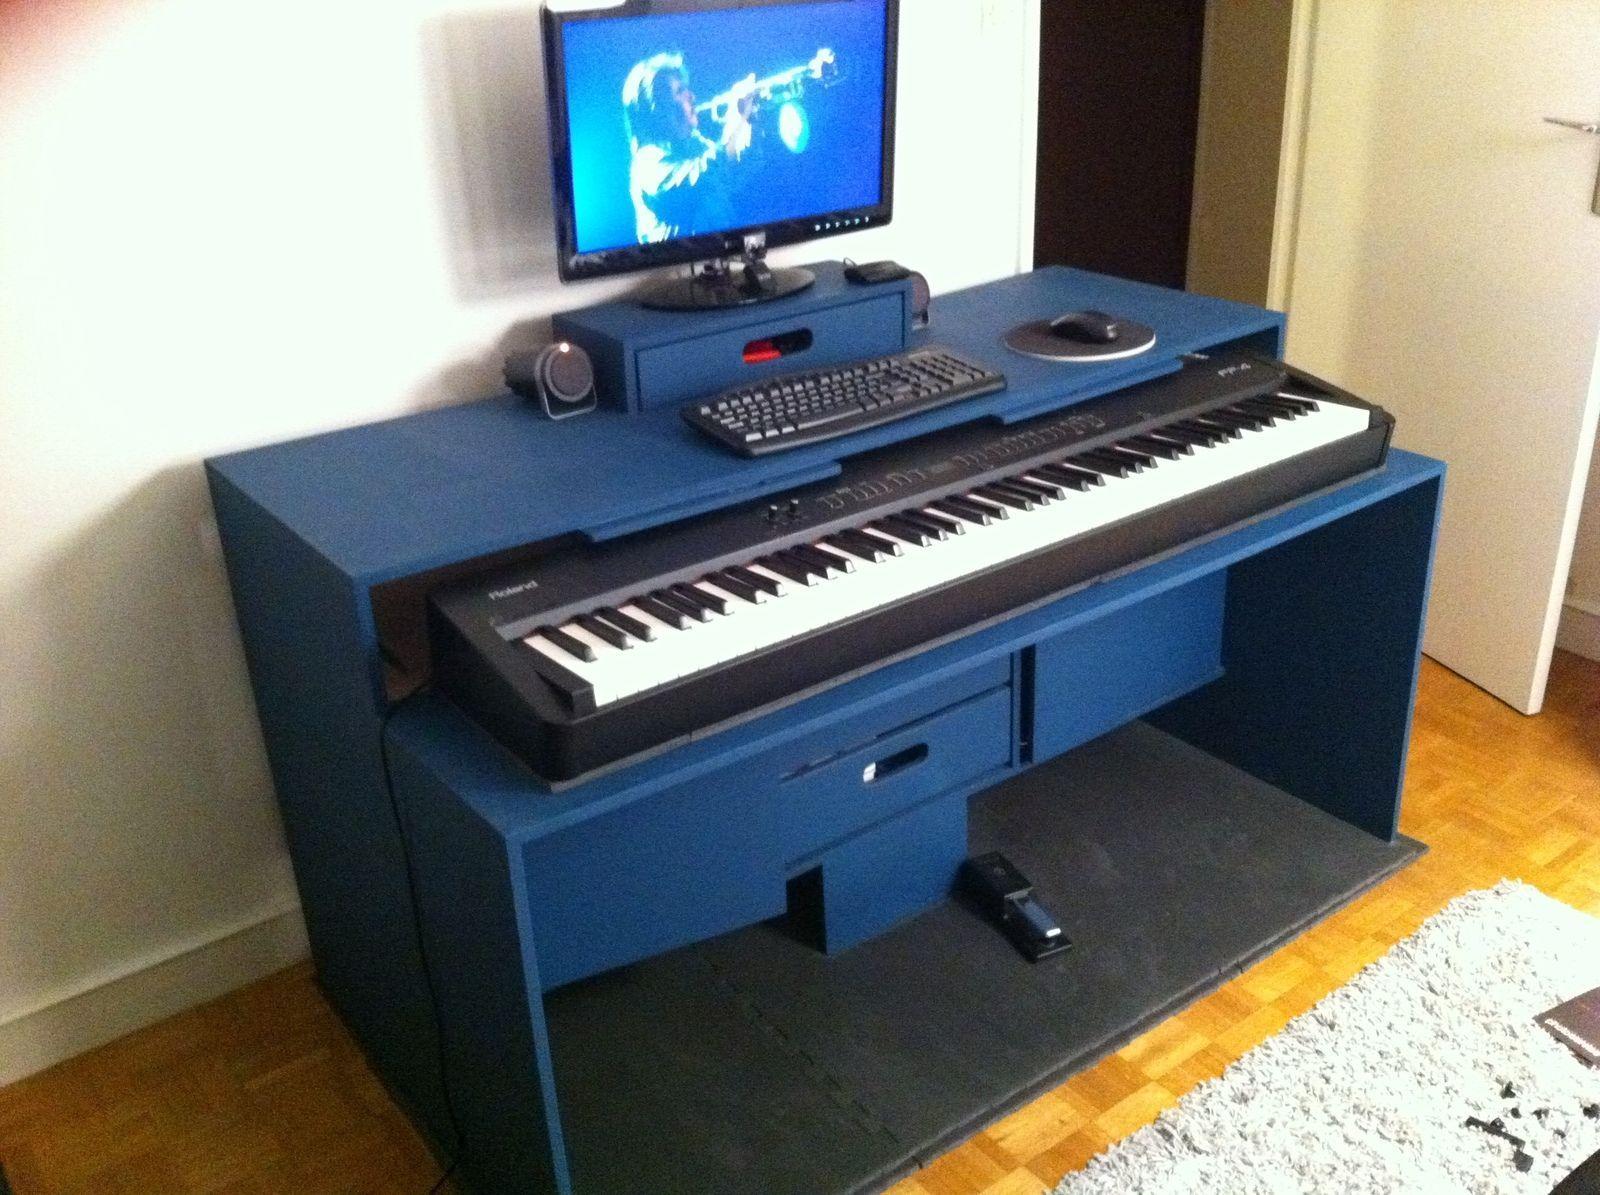 No name meuble studio rack image 219156 audiofanzine for Meuble salon